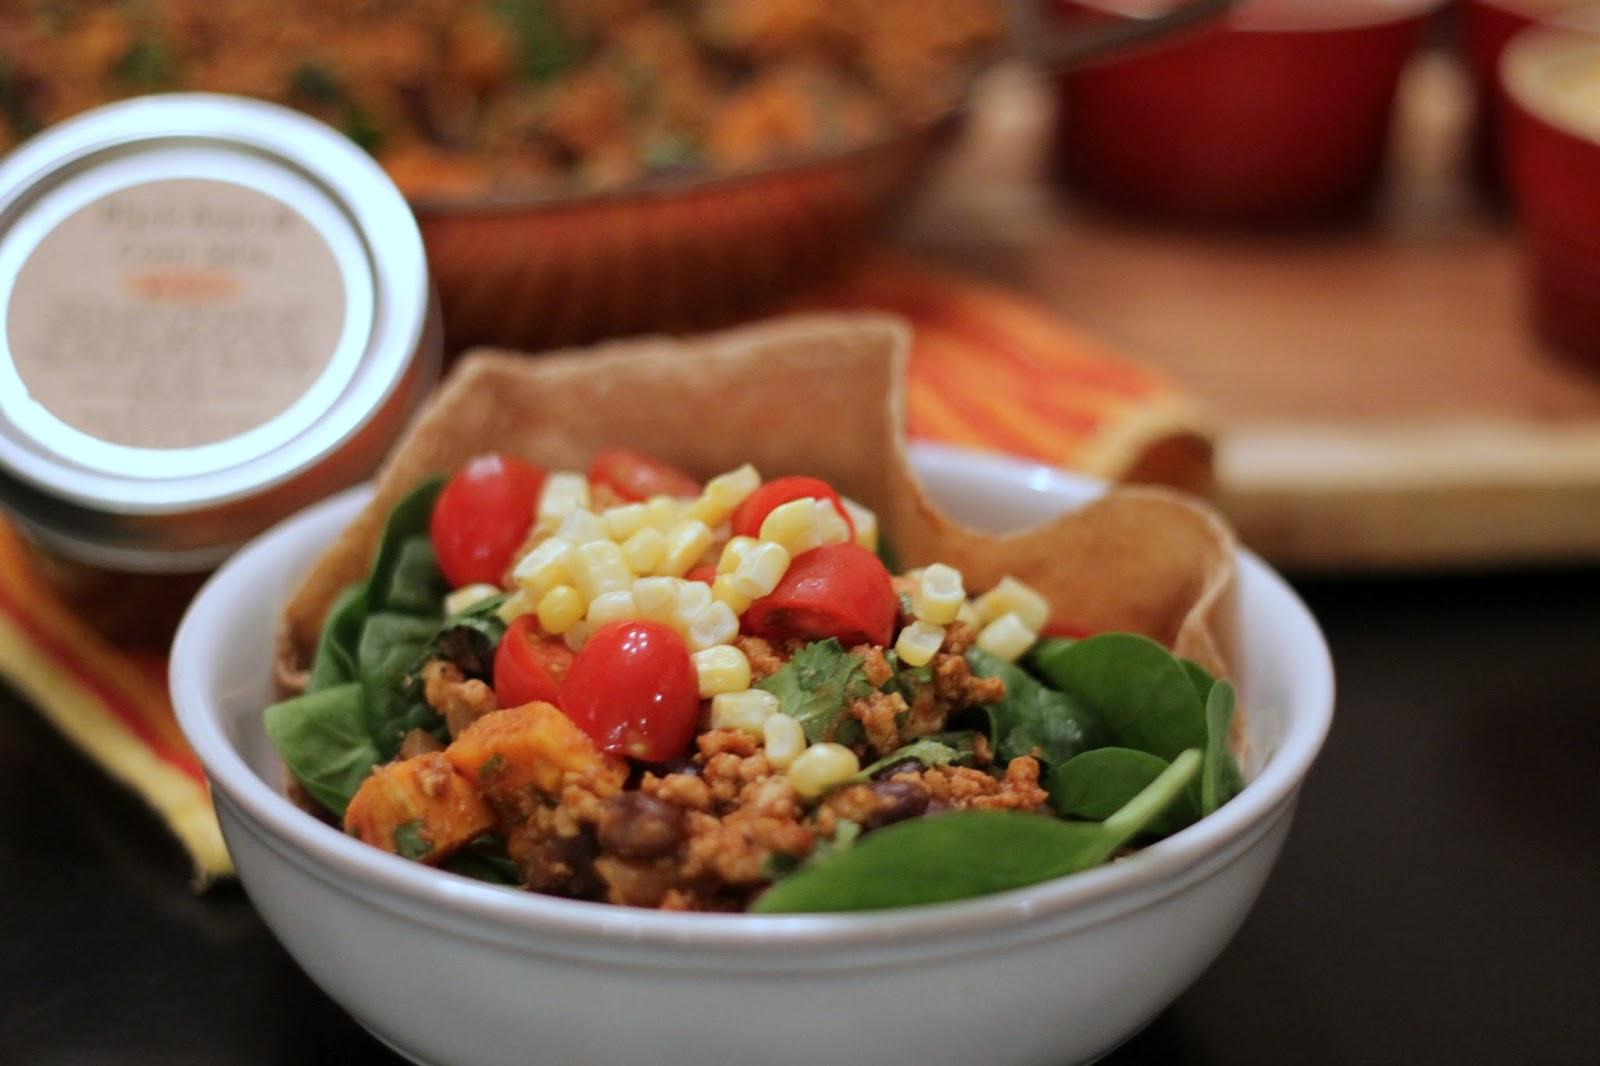 Turkey, Black Bean and Sweet Potato Taco Salad Bowls